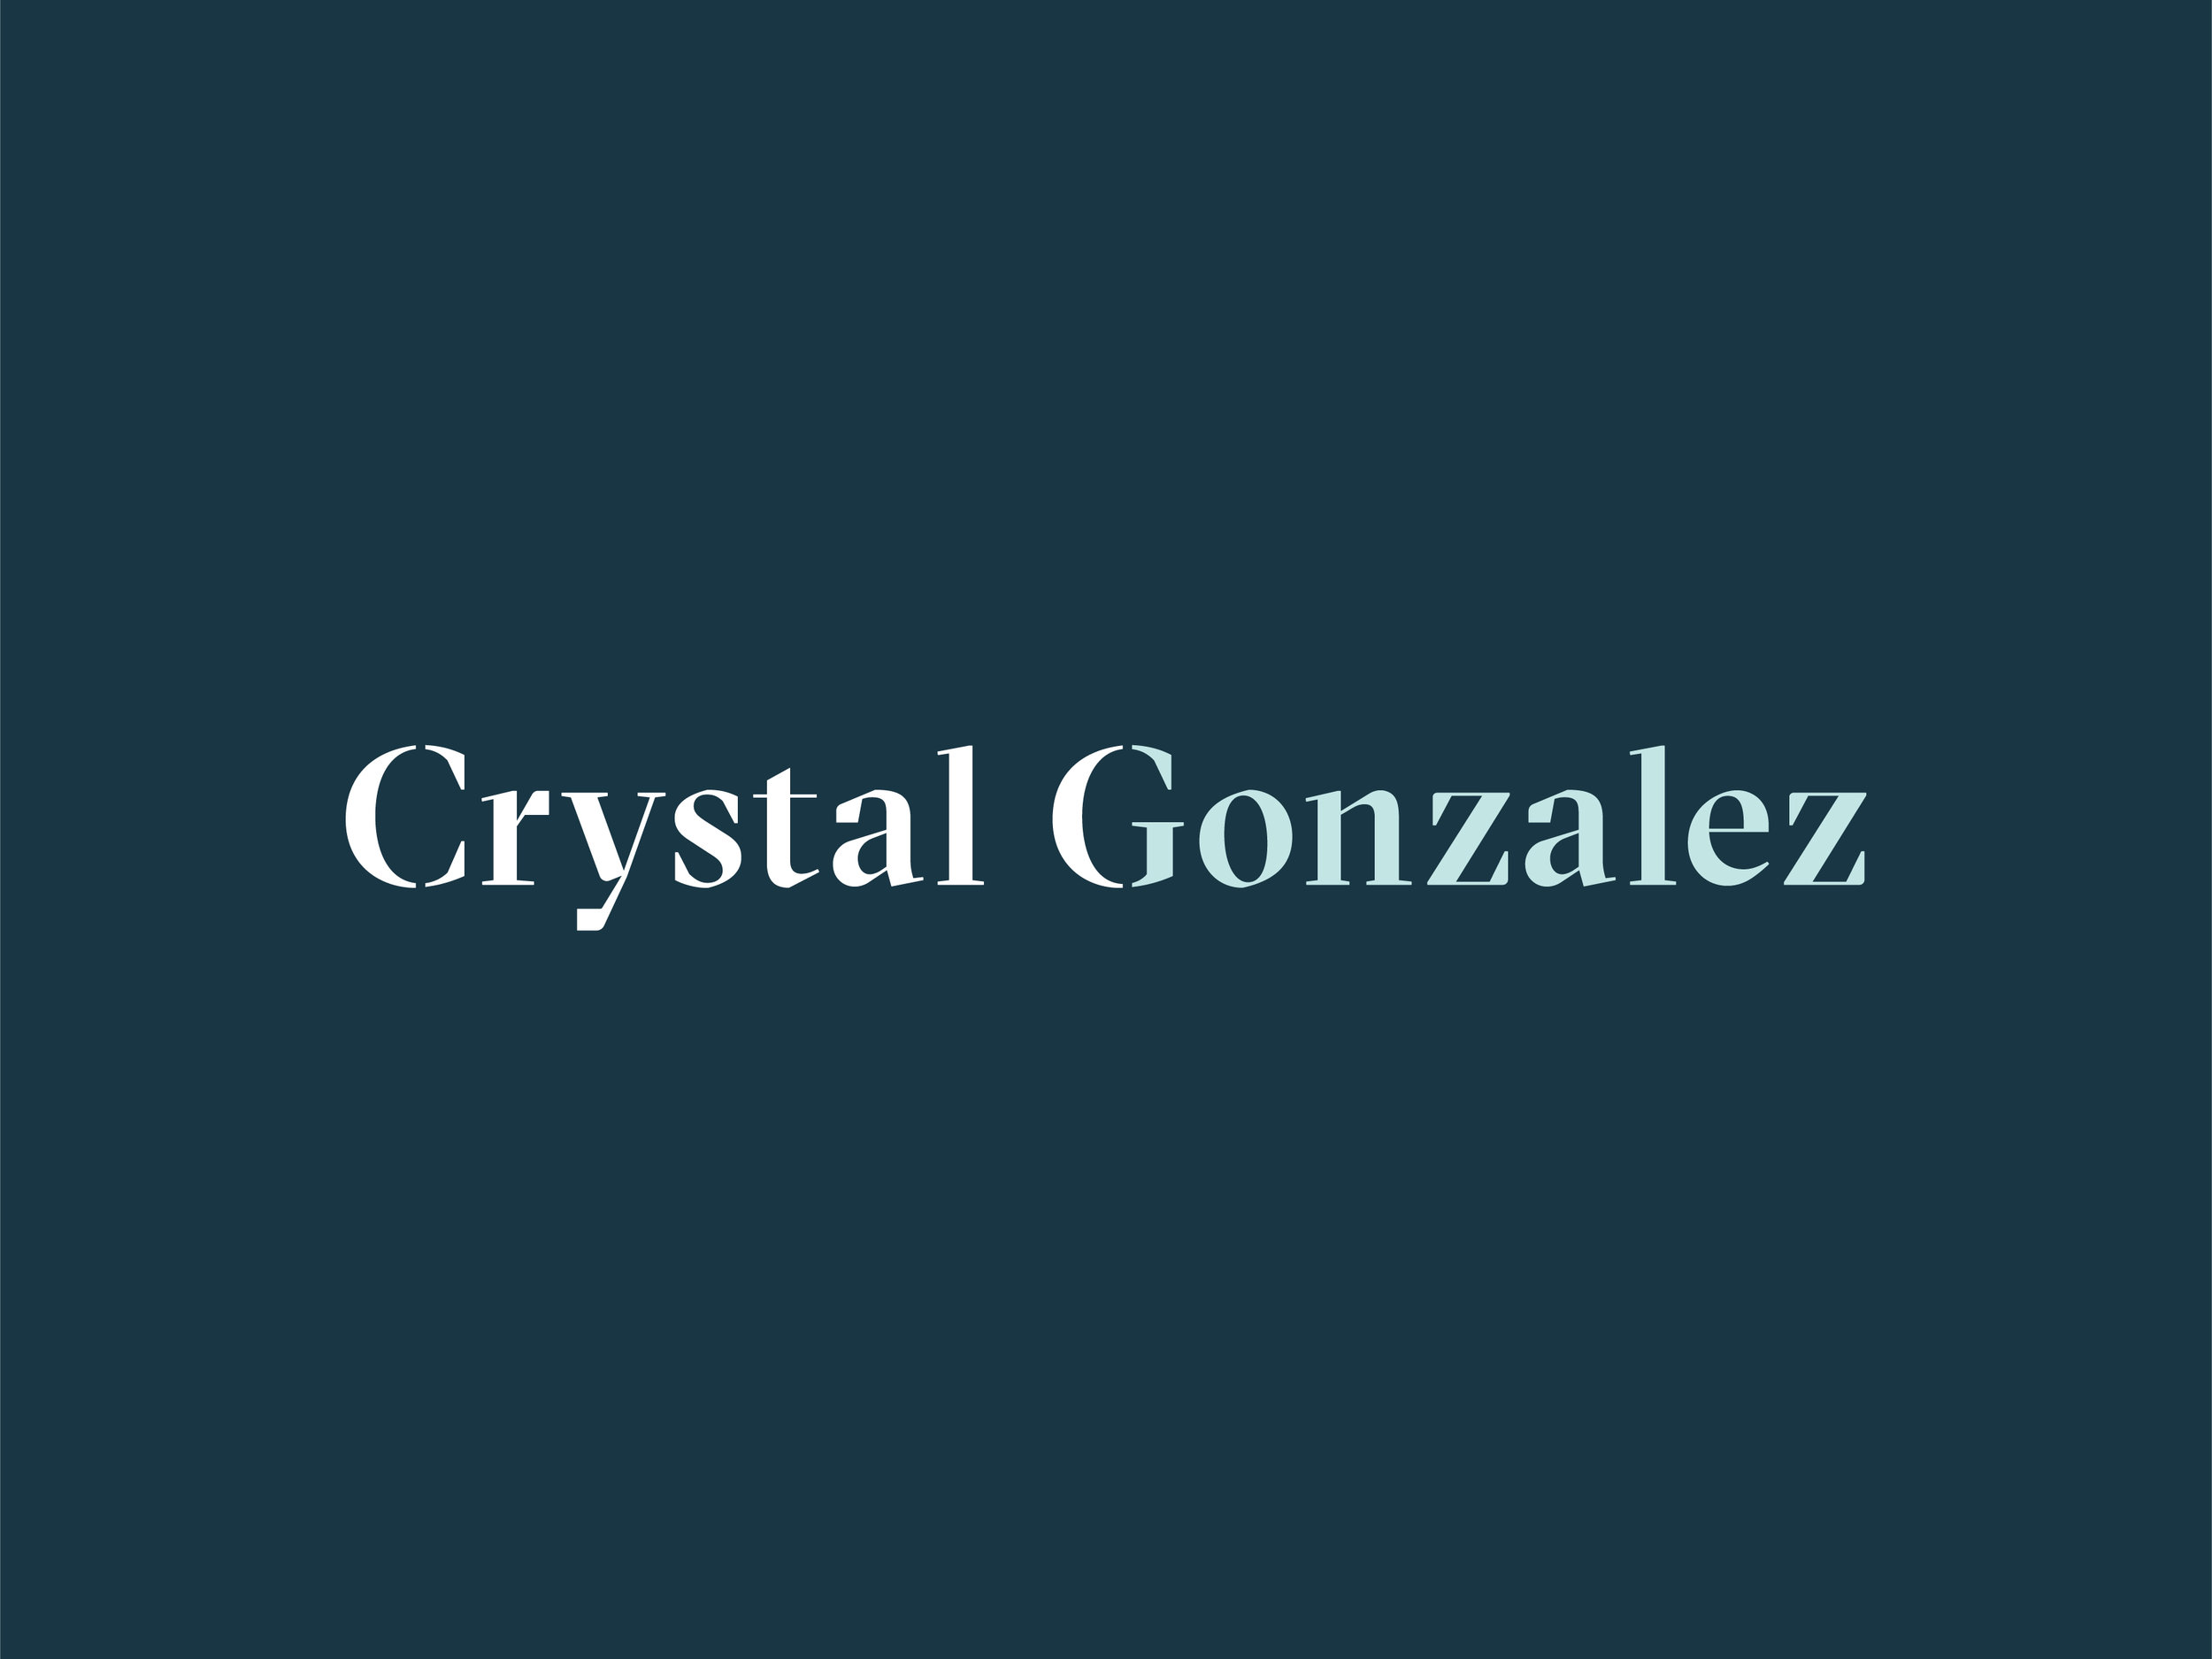 AmyNortman-CrystalGonzalez-01